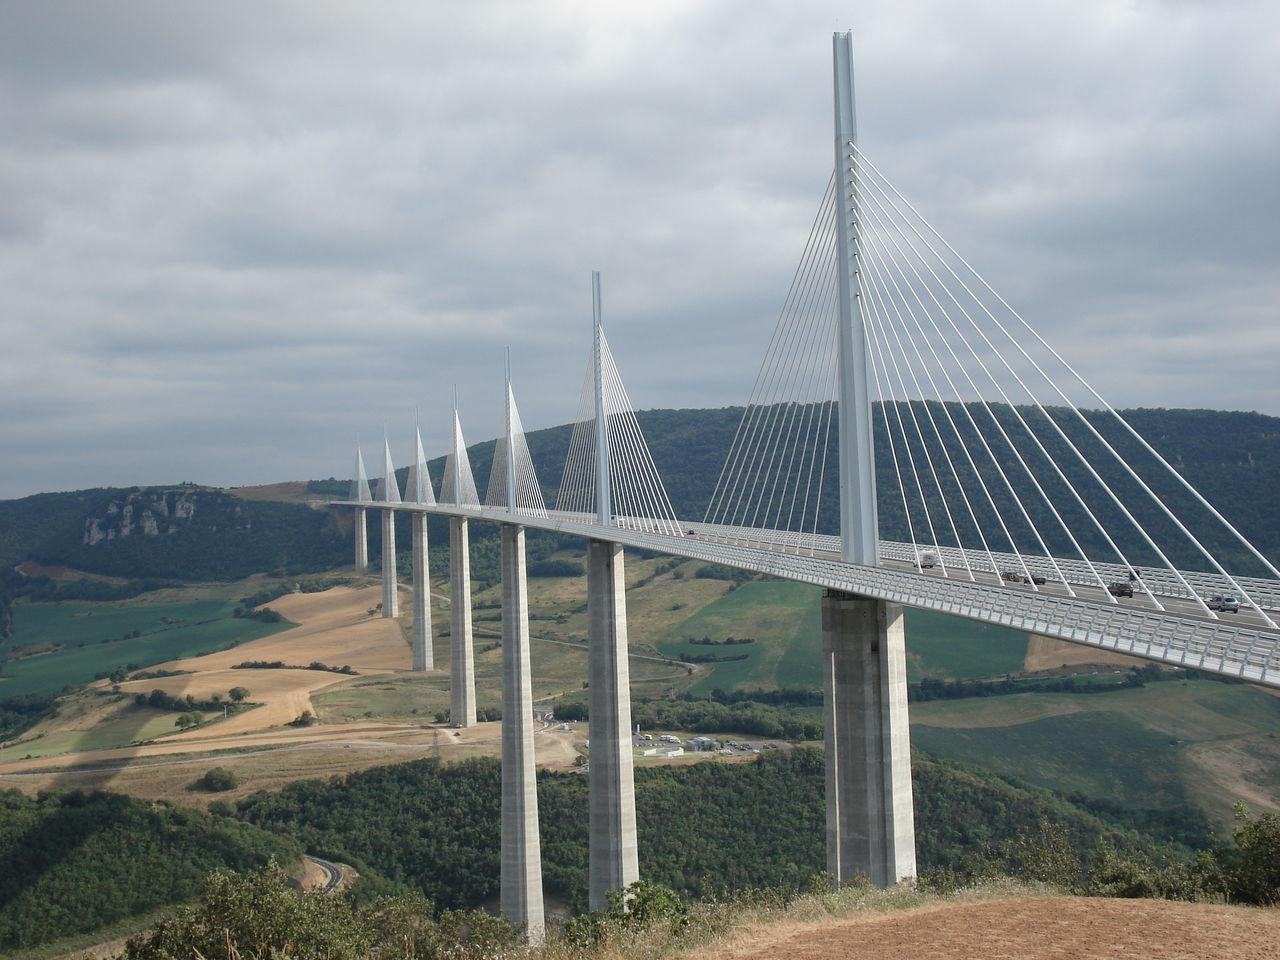 Millau viaduct against cloudy sky